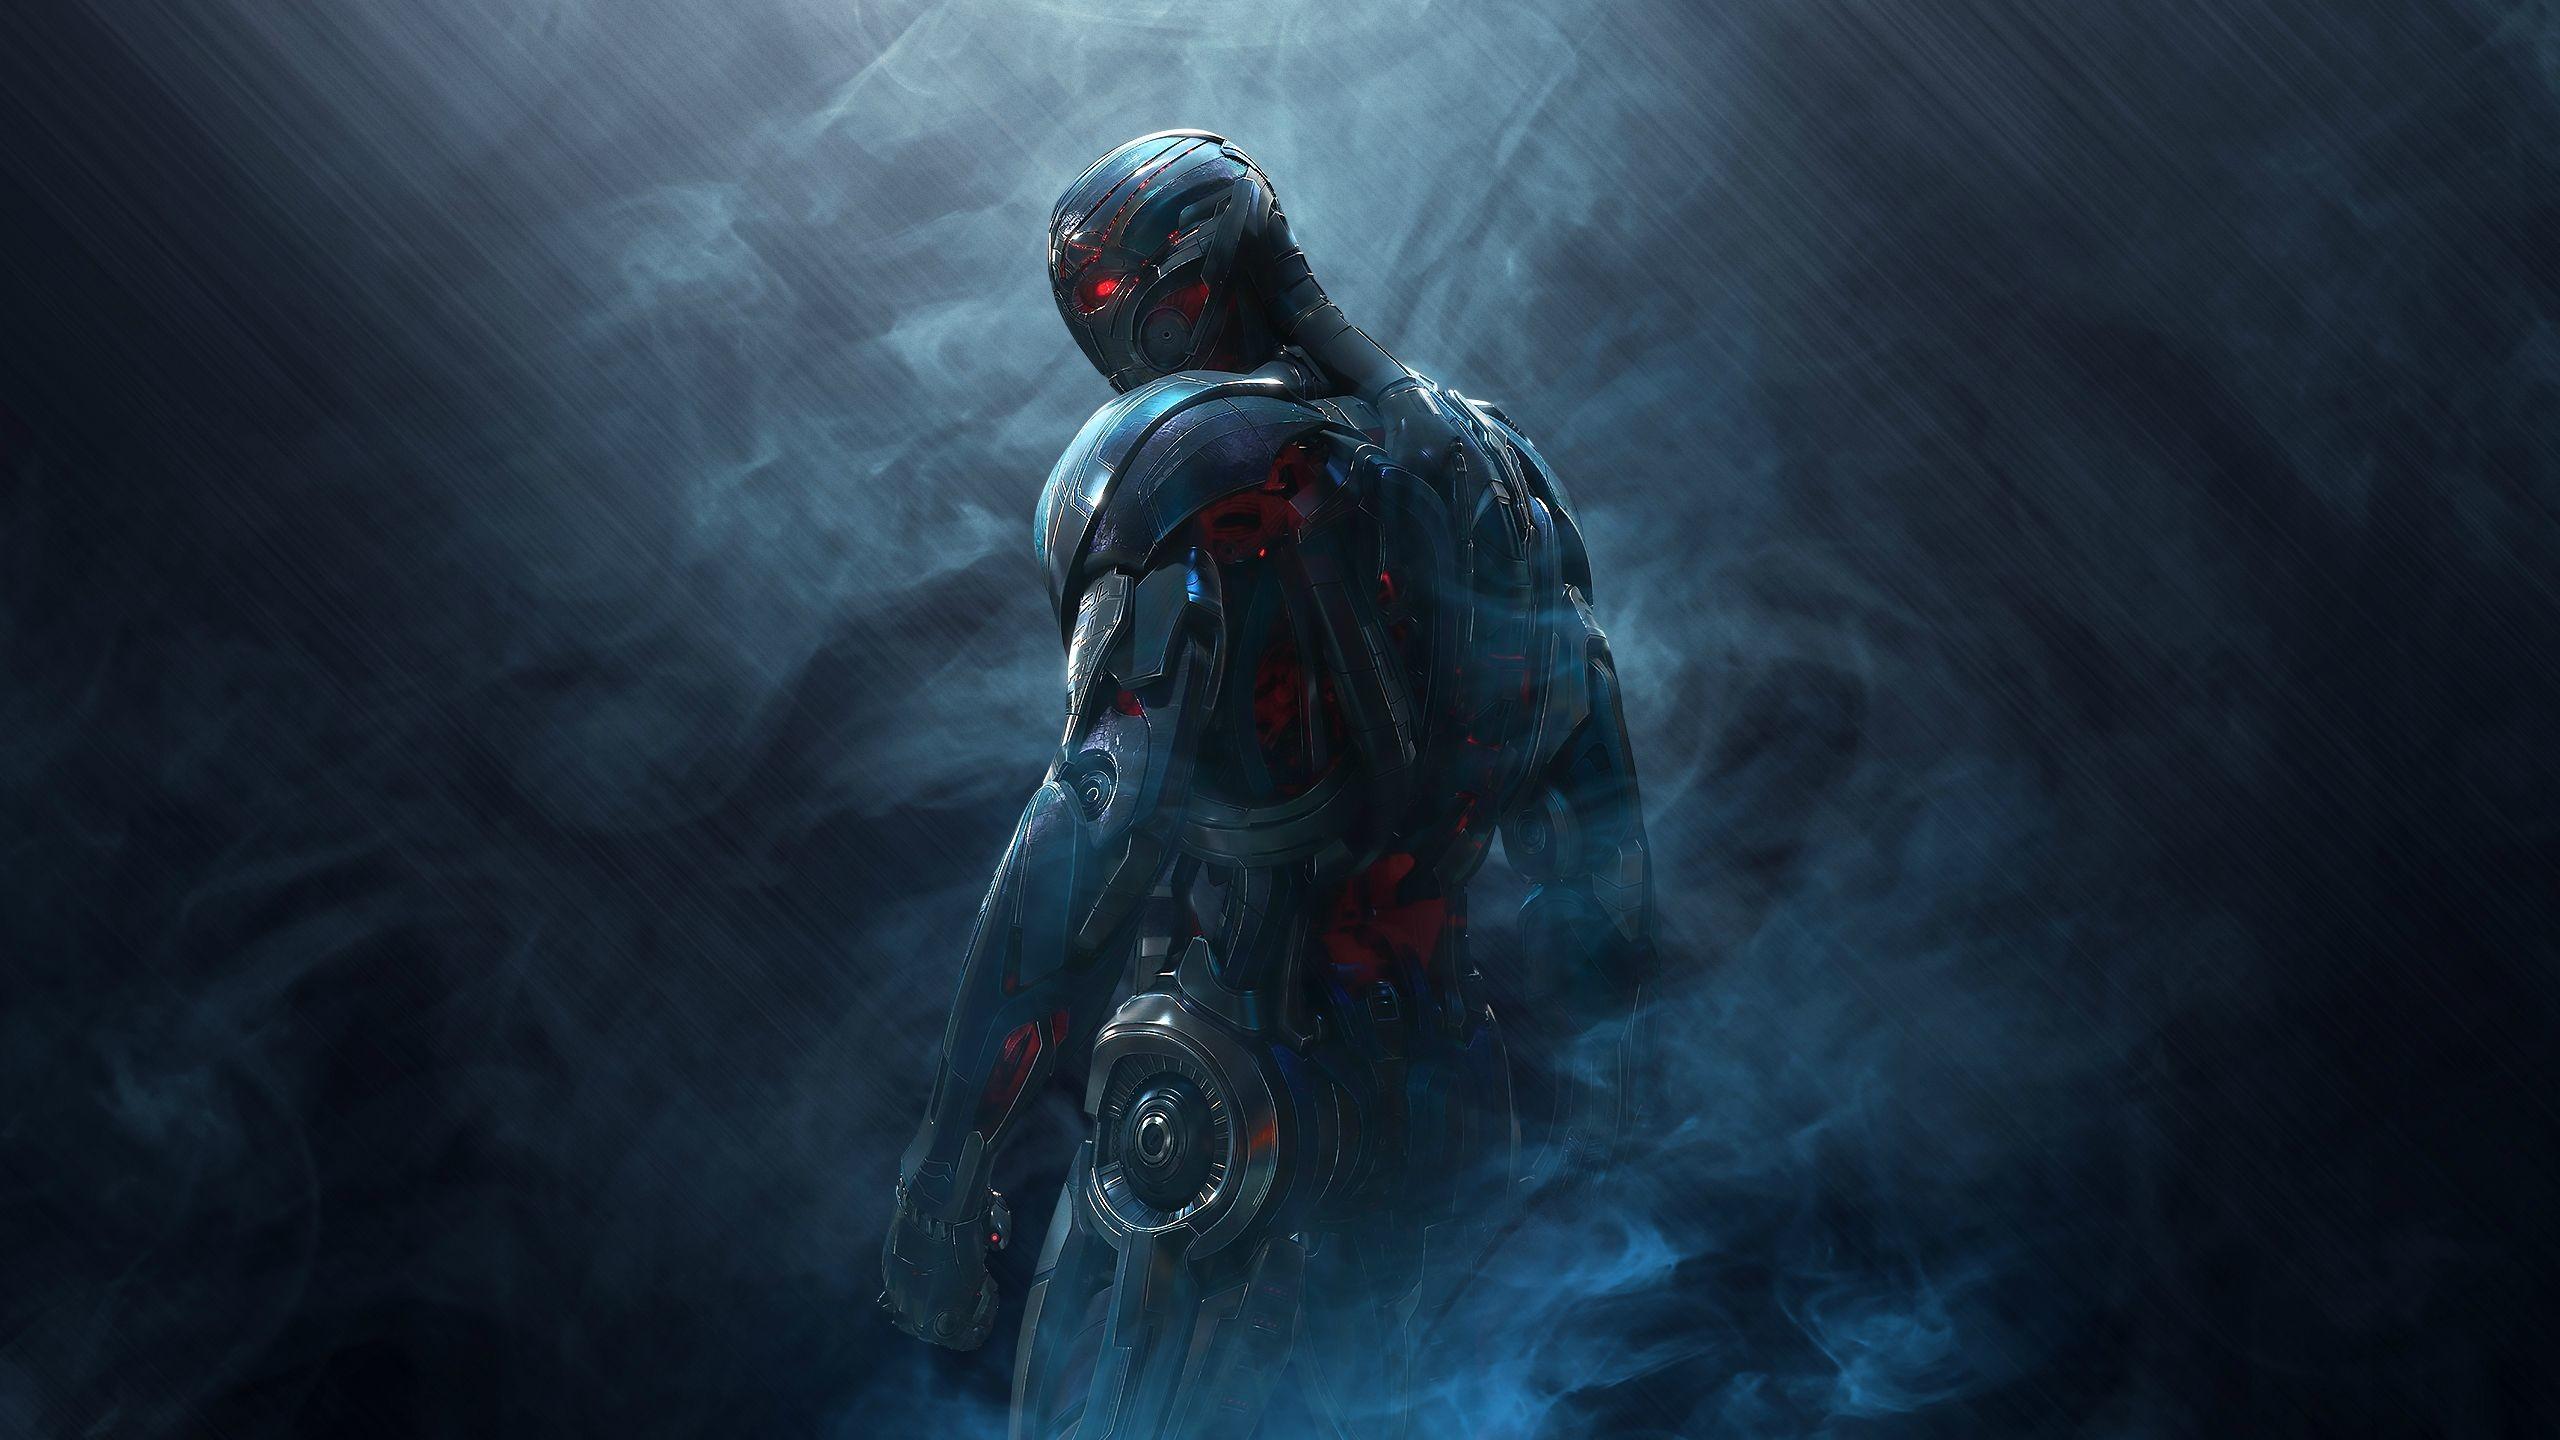 Wallpaper Ultron, Avengers age of ultron, Avengers